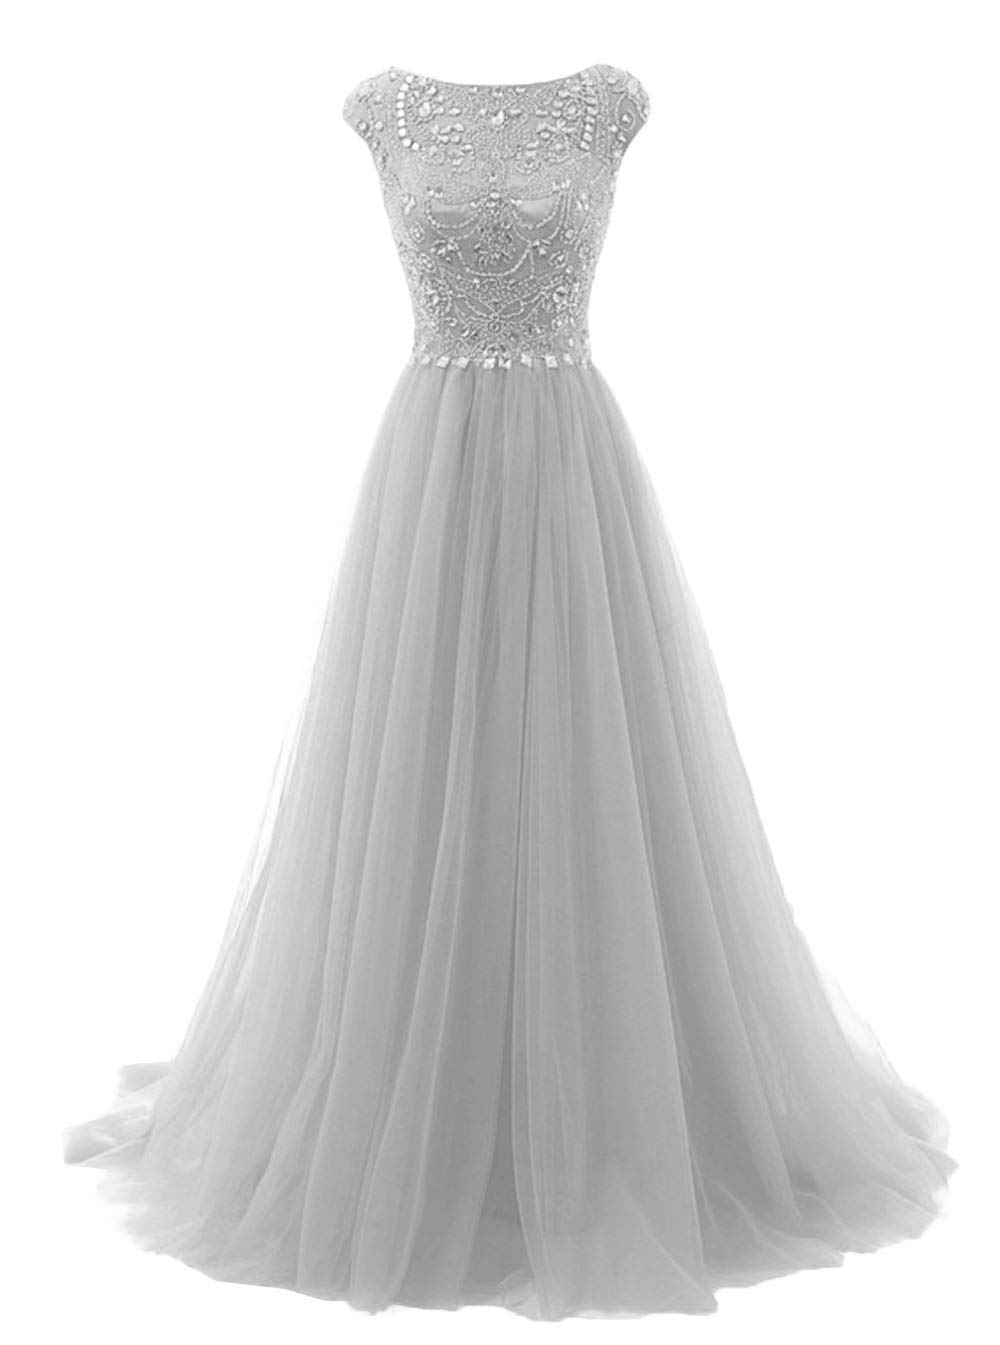 Promworld Women's Wedding Bridesmaid Dress Cap Sleeve Crystal Tulle Long Prom Dresses